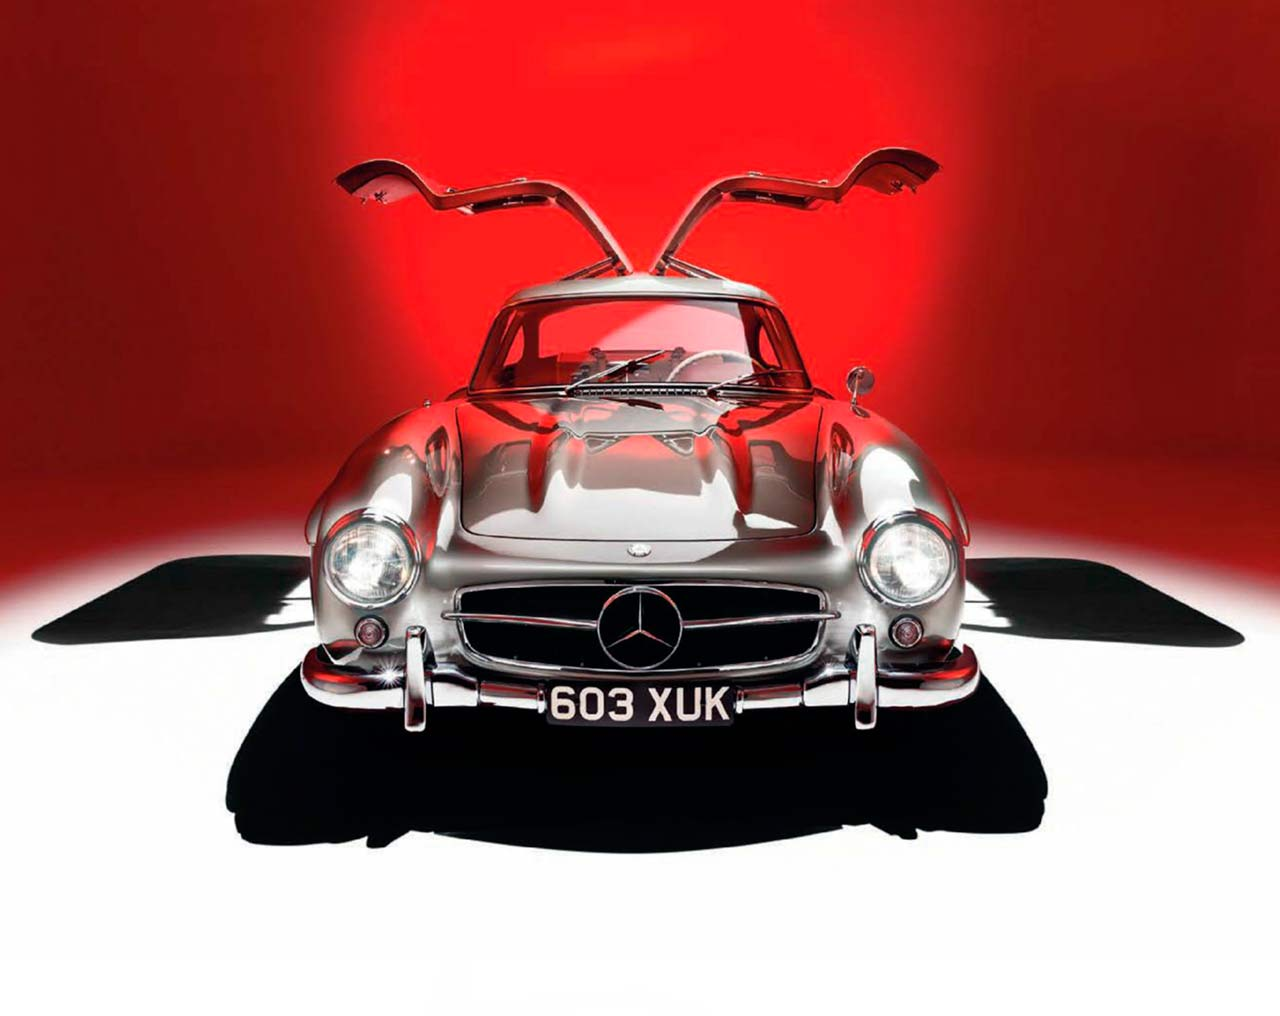 1954 Mercedes-Benz 300SL Gullwing W198 extraordinary '50s supercar was a technological marvel